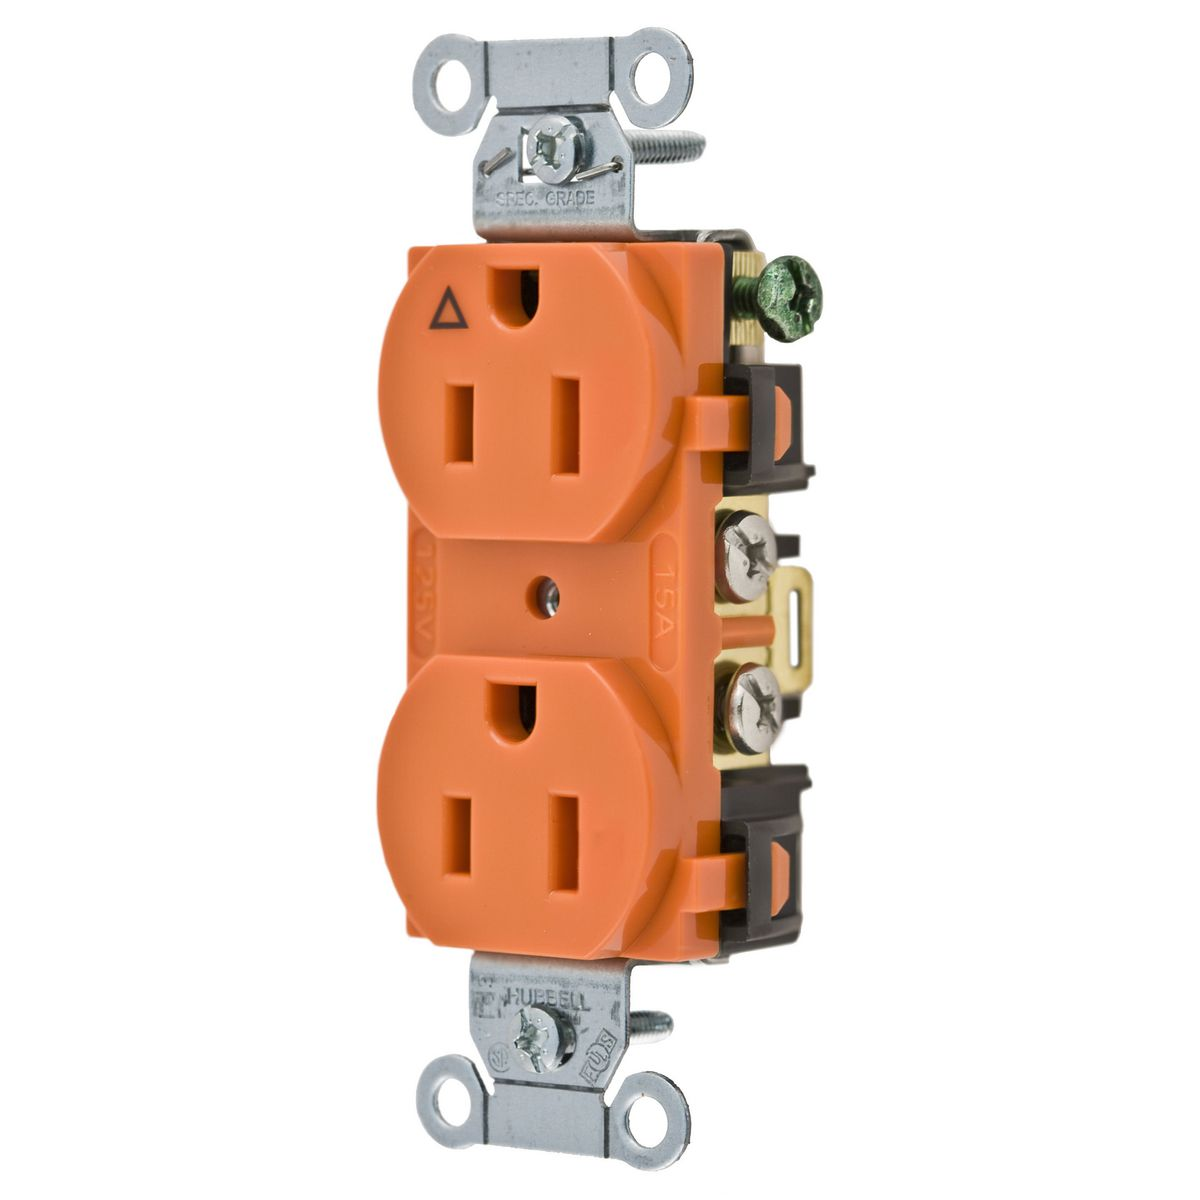 duplex receptacle diagram 12v relay wiring spotlights ig5252 brand device kellems